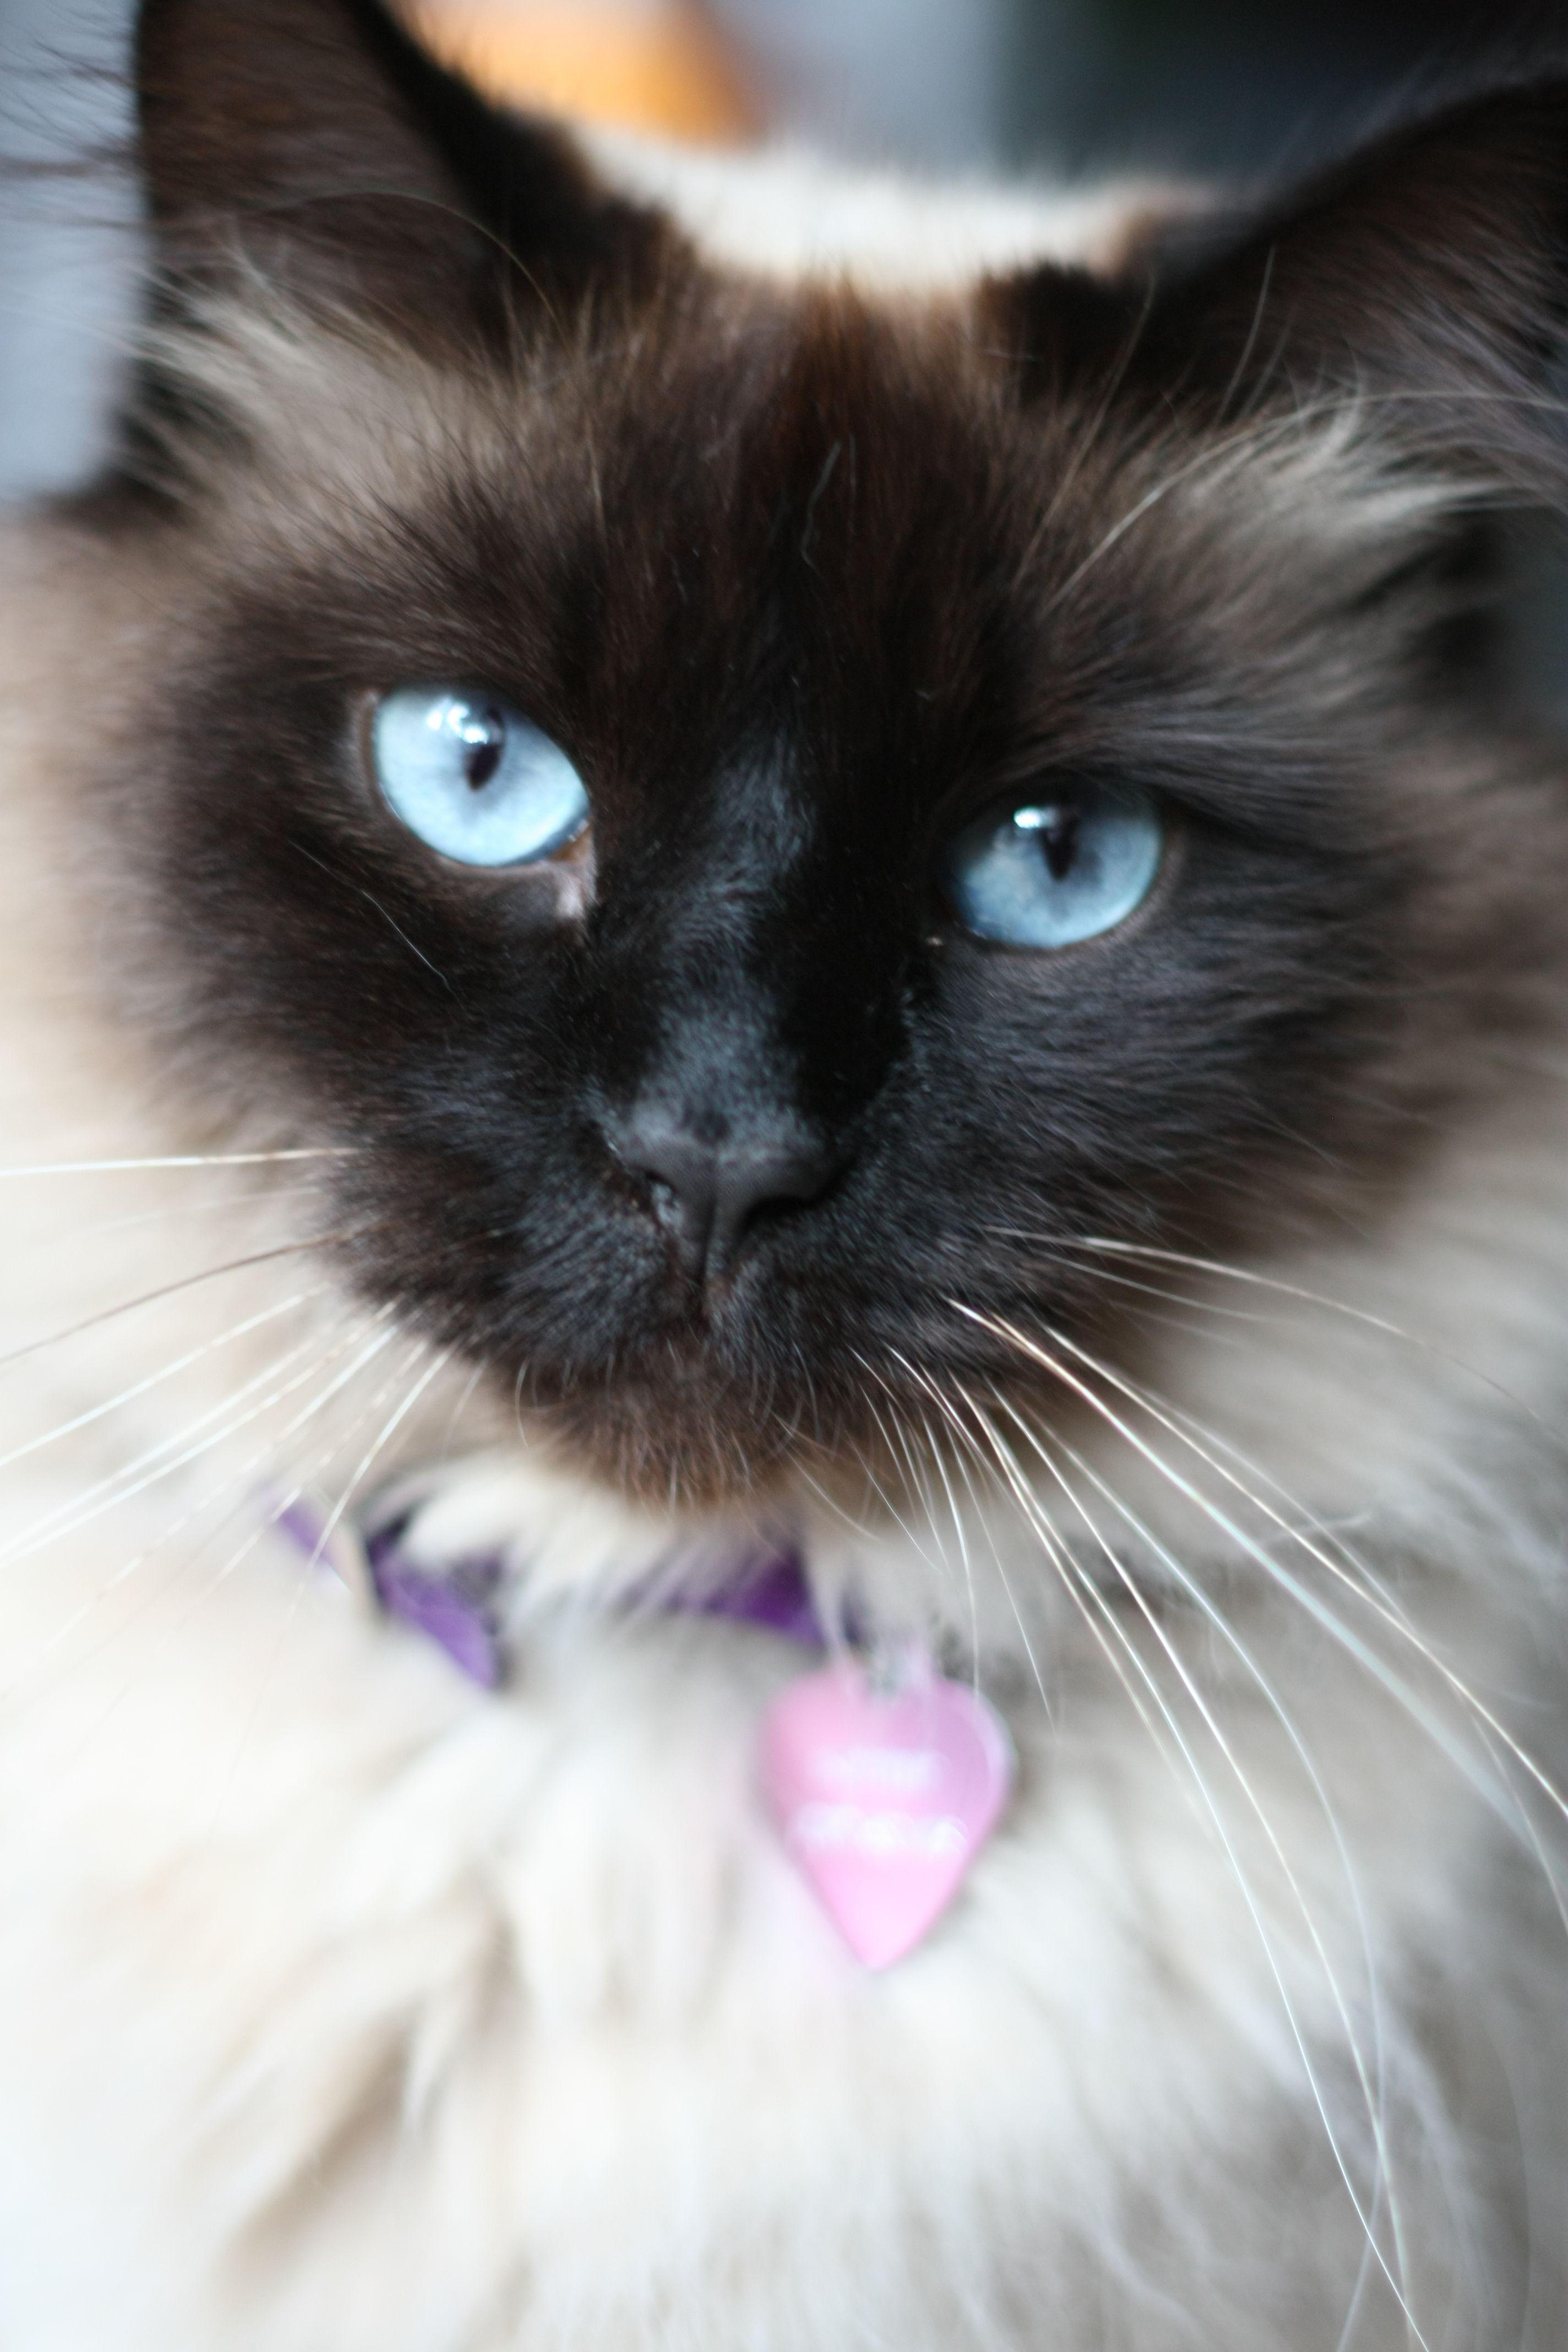 Balinese cat looks exactly like my cat Latte